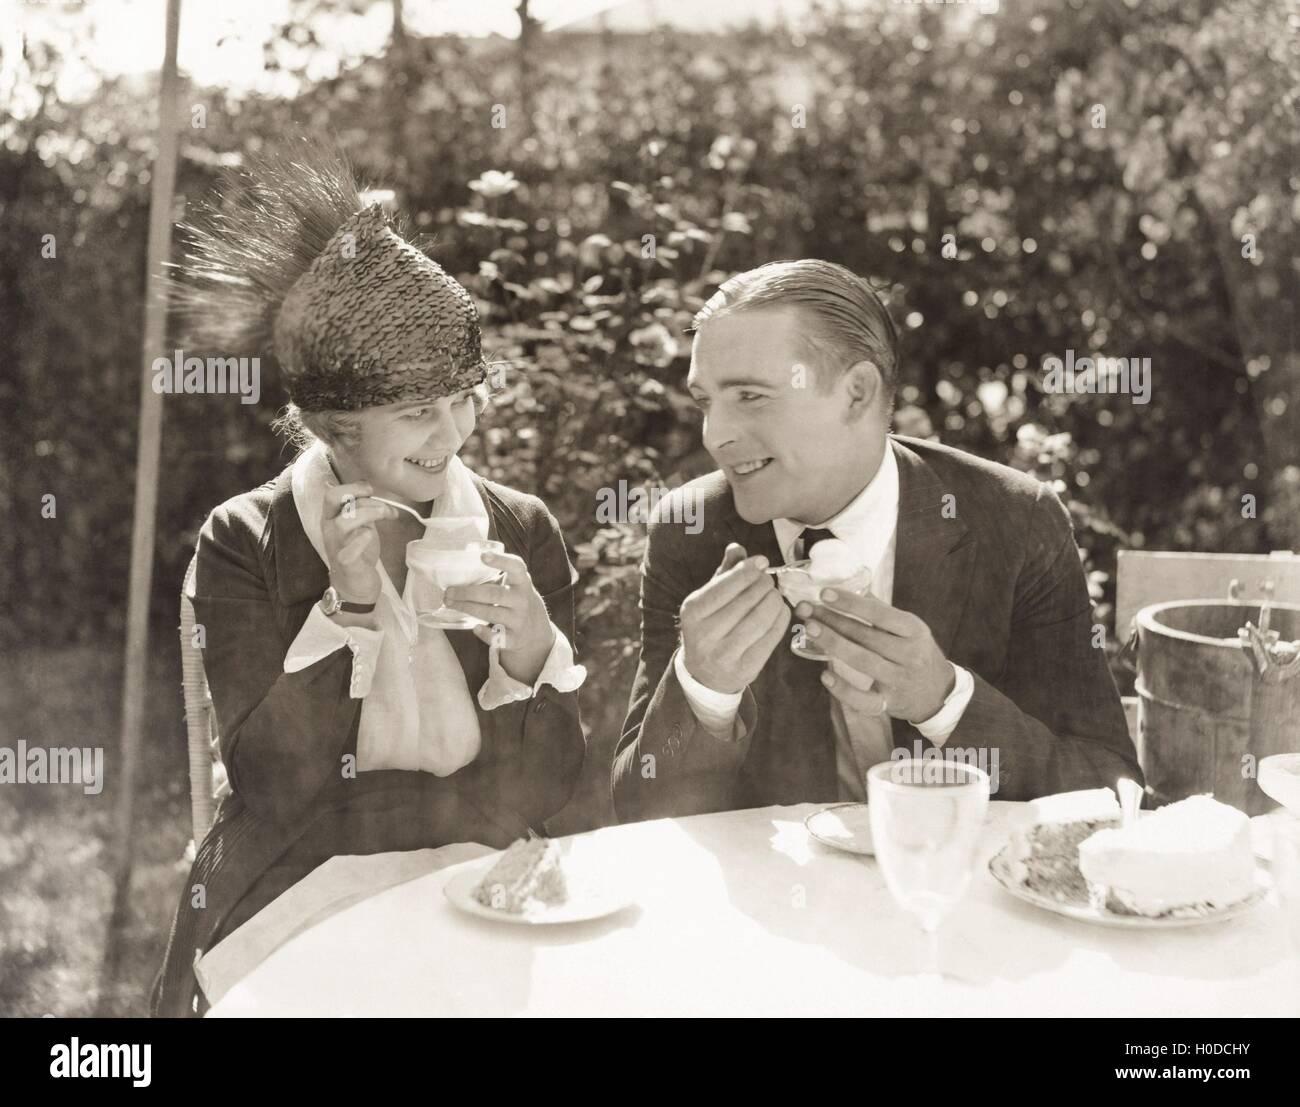 Couple eating ice cream and cake - Stock Image